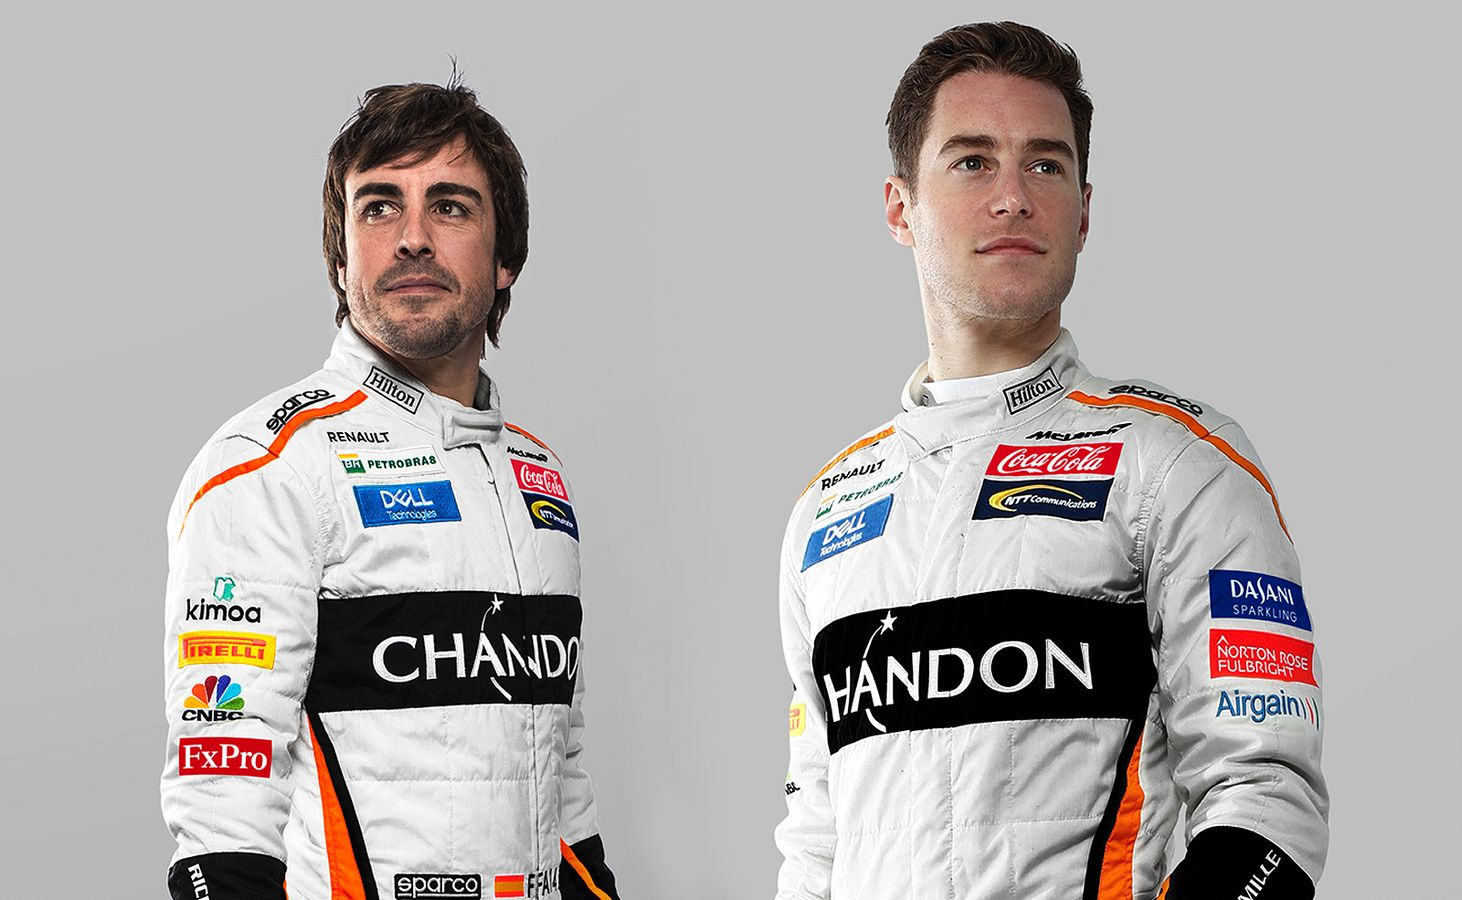 Coca-Cola busca conquistar la F1 con McLaren